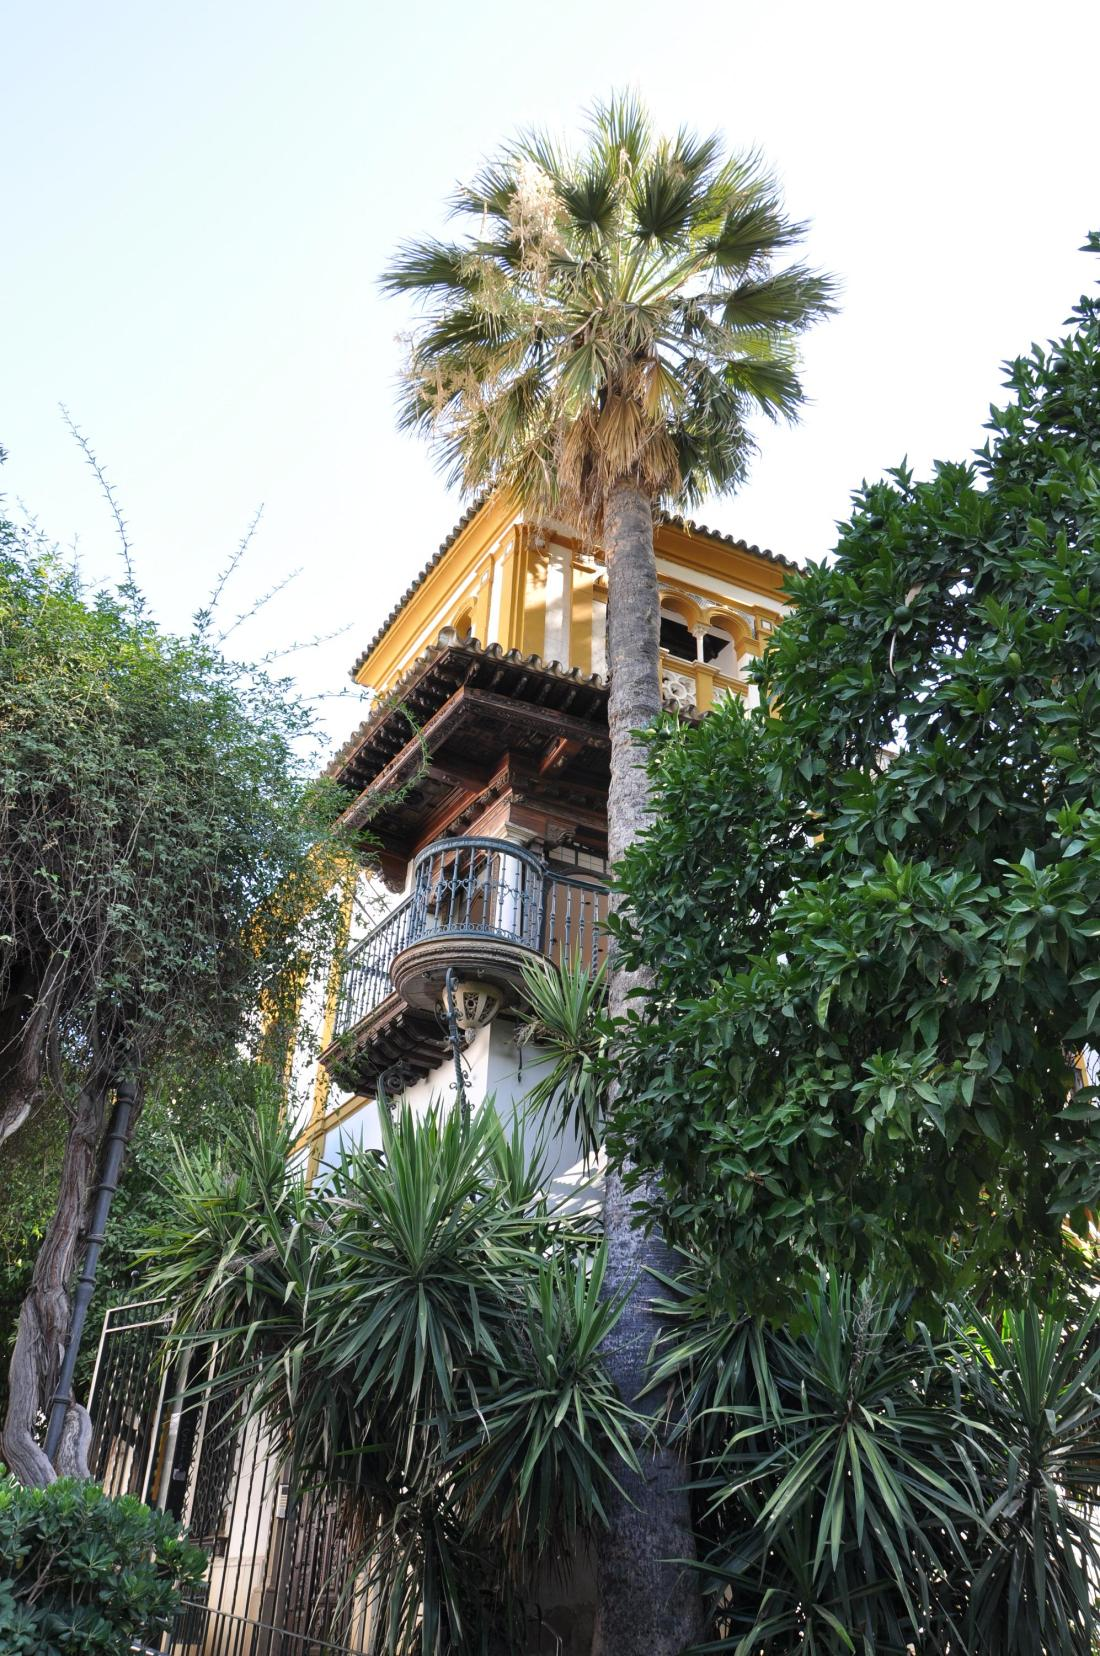 seville ornate balcony